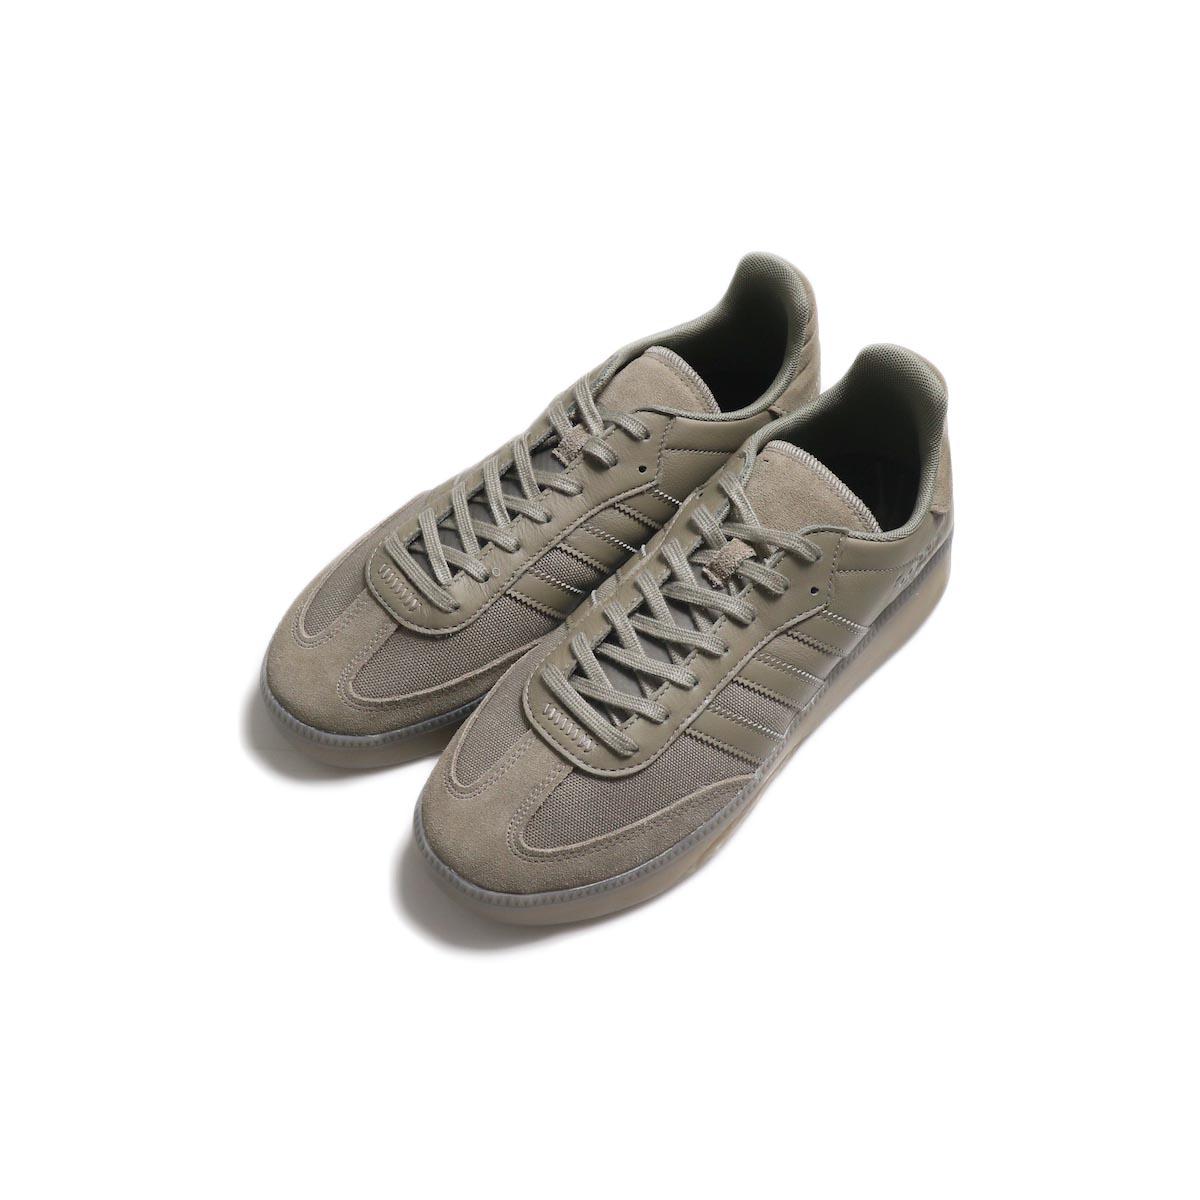 adidas originals / SAMBA RM -Olive/Brown